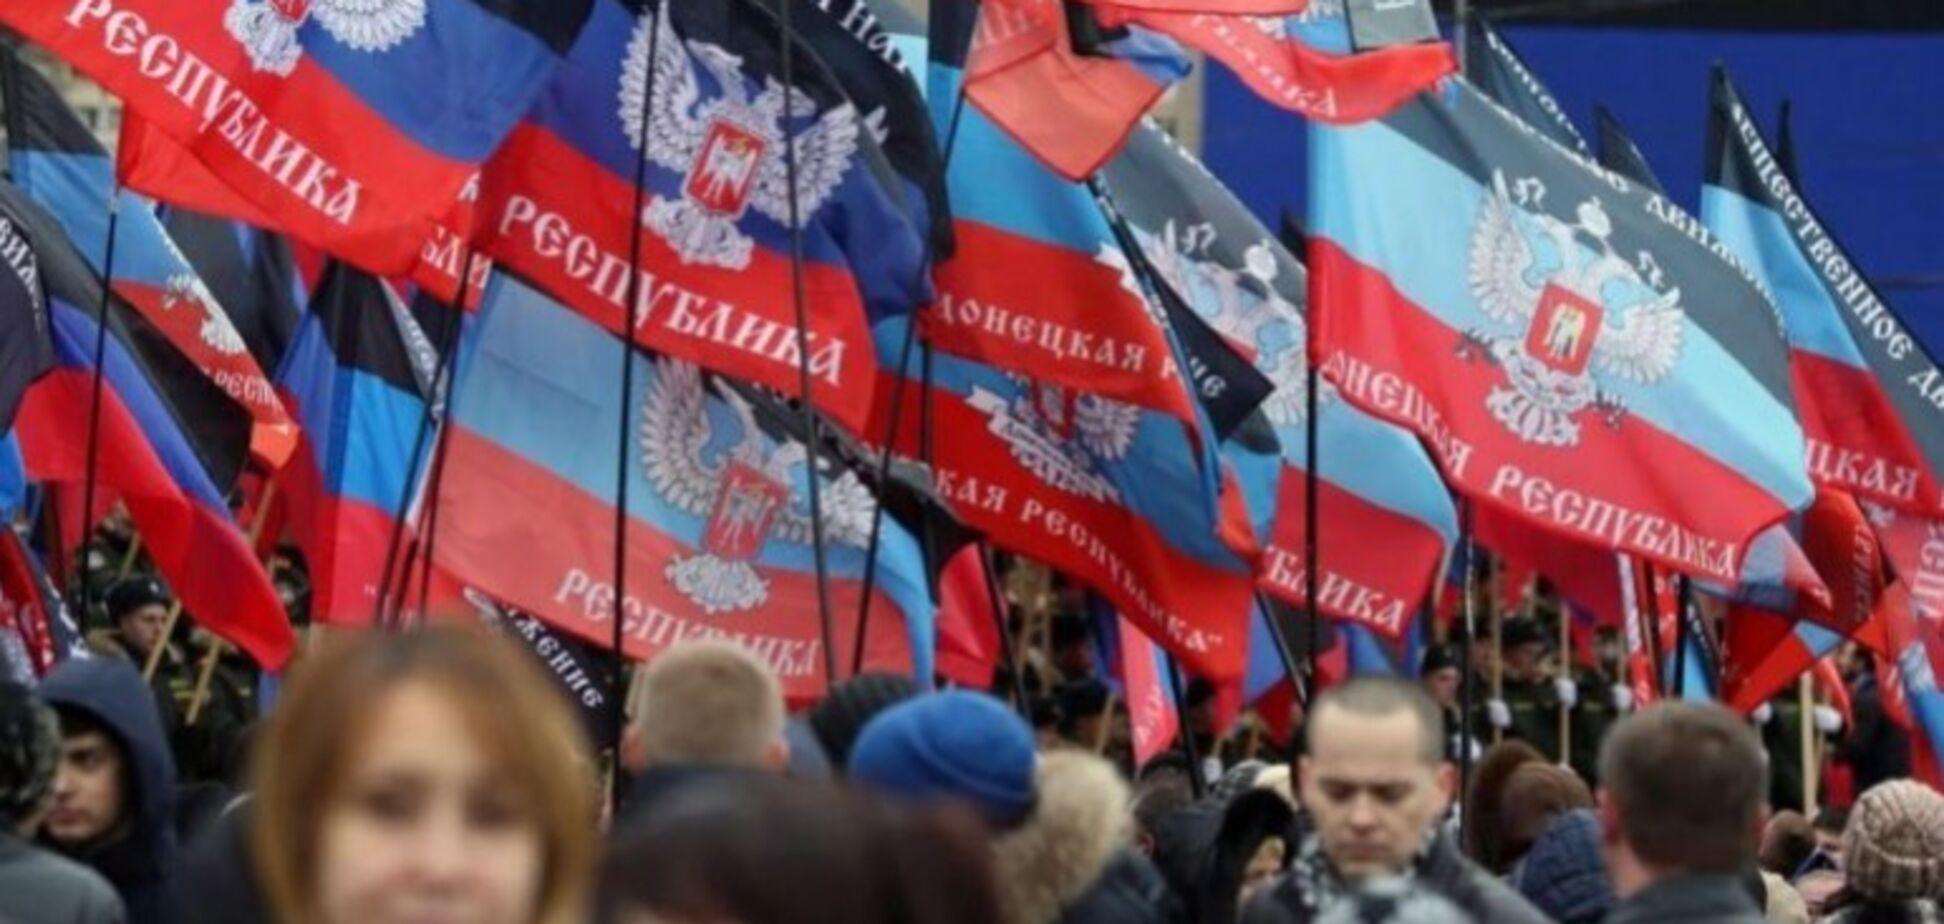 У 'ДНР' провели тотальну русифікацію